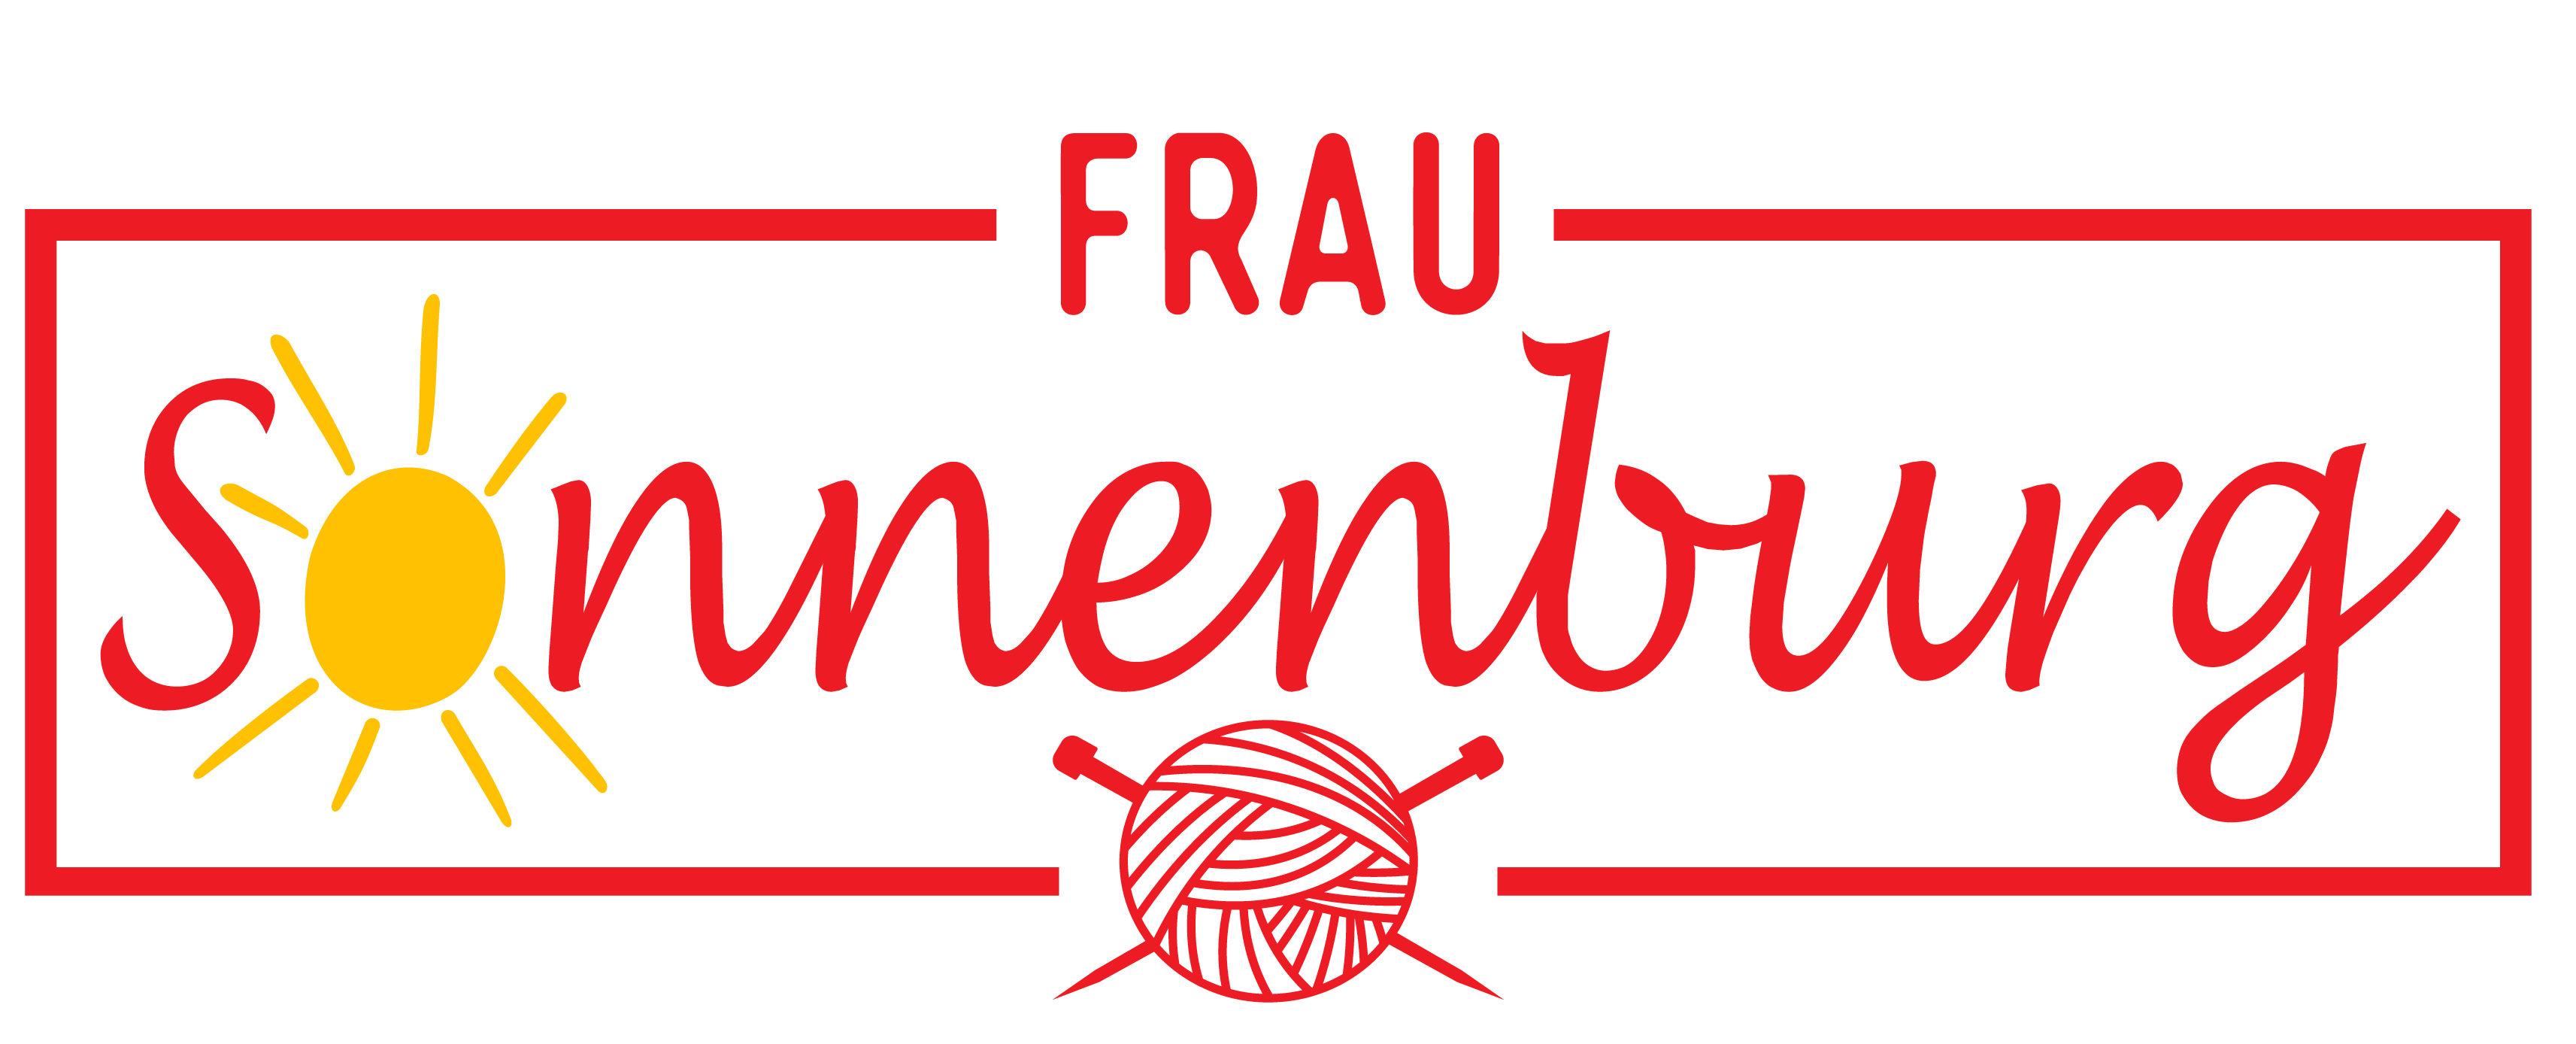 Frau Sonnenburg